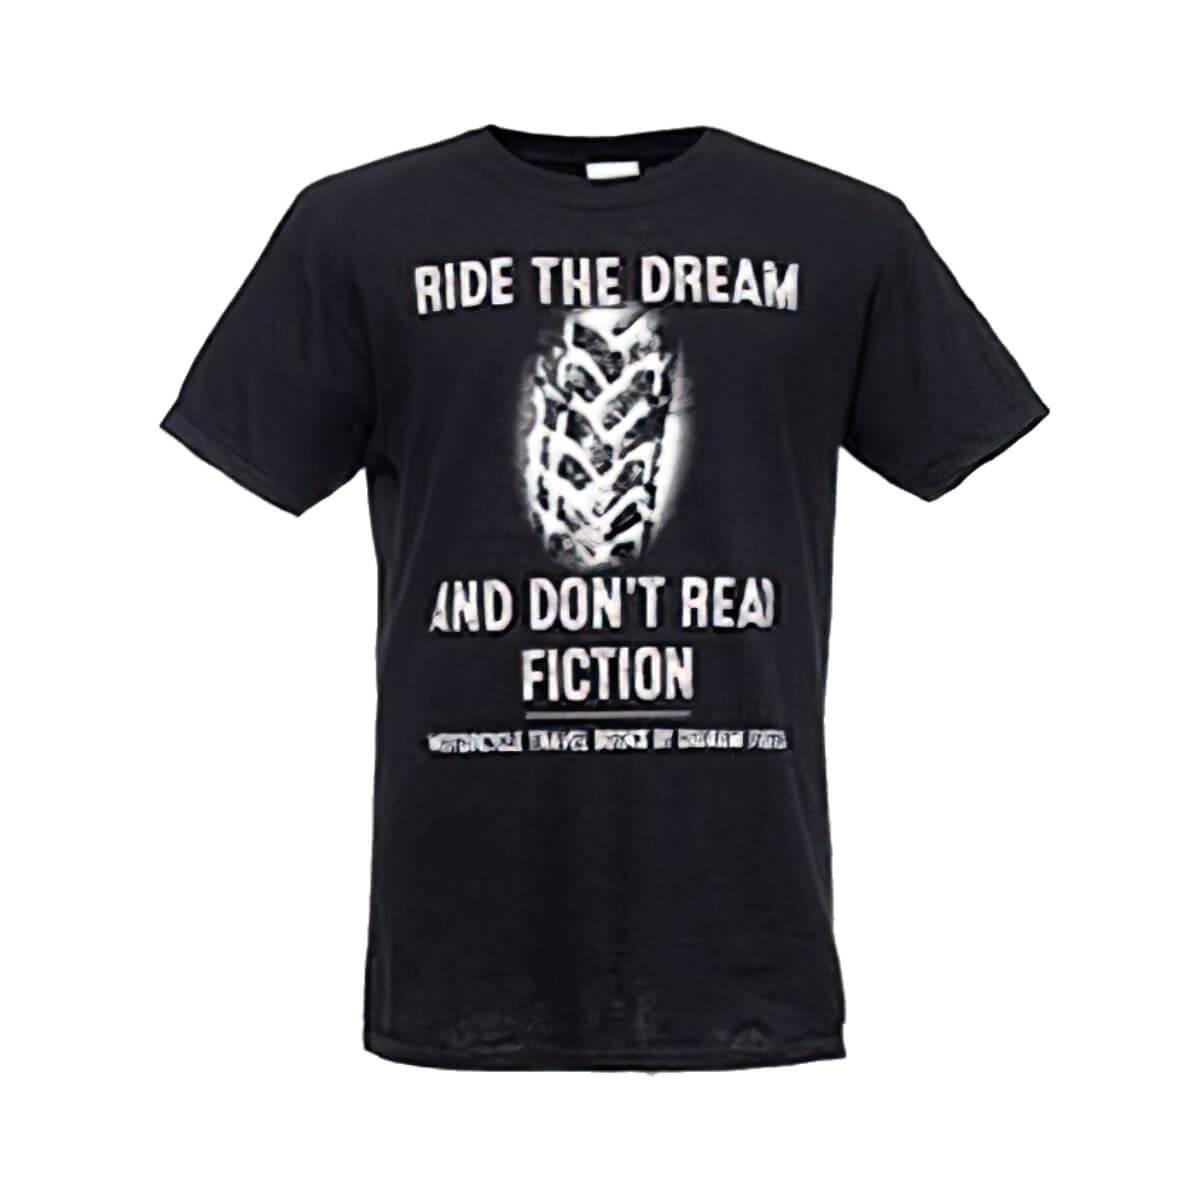 Ride the Dream - Black Shirt